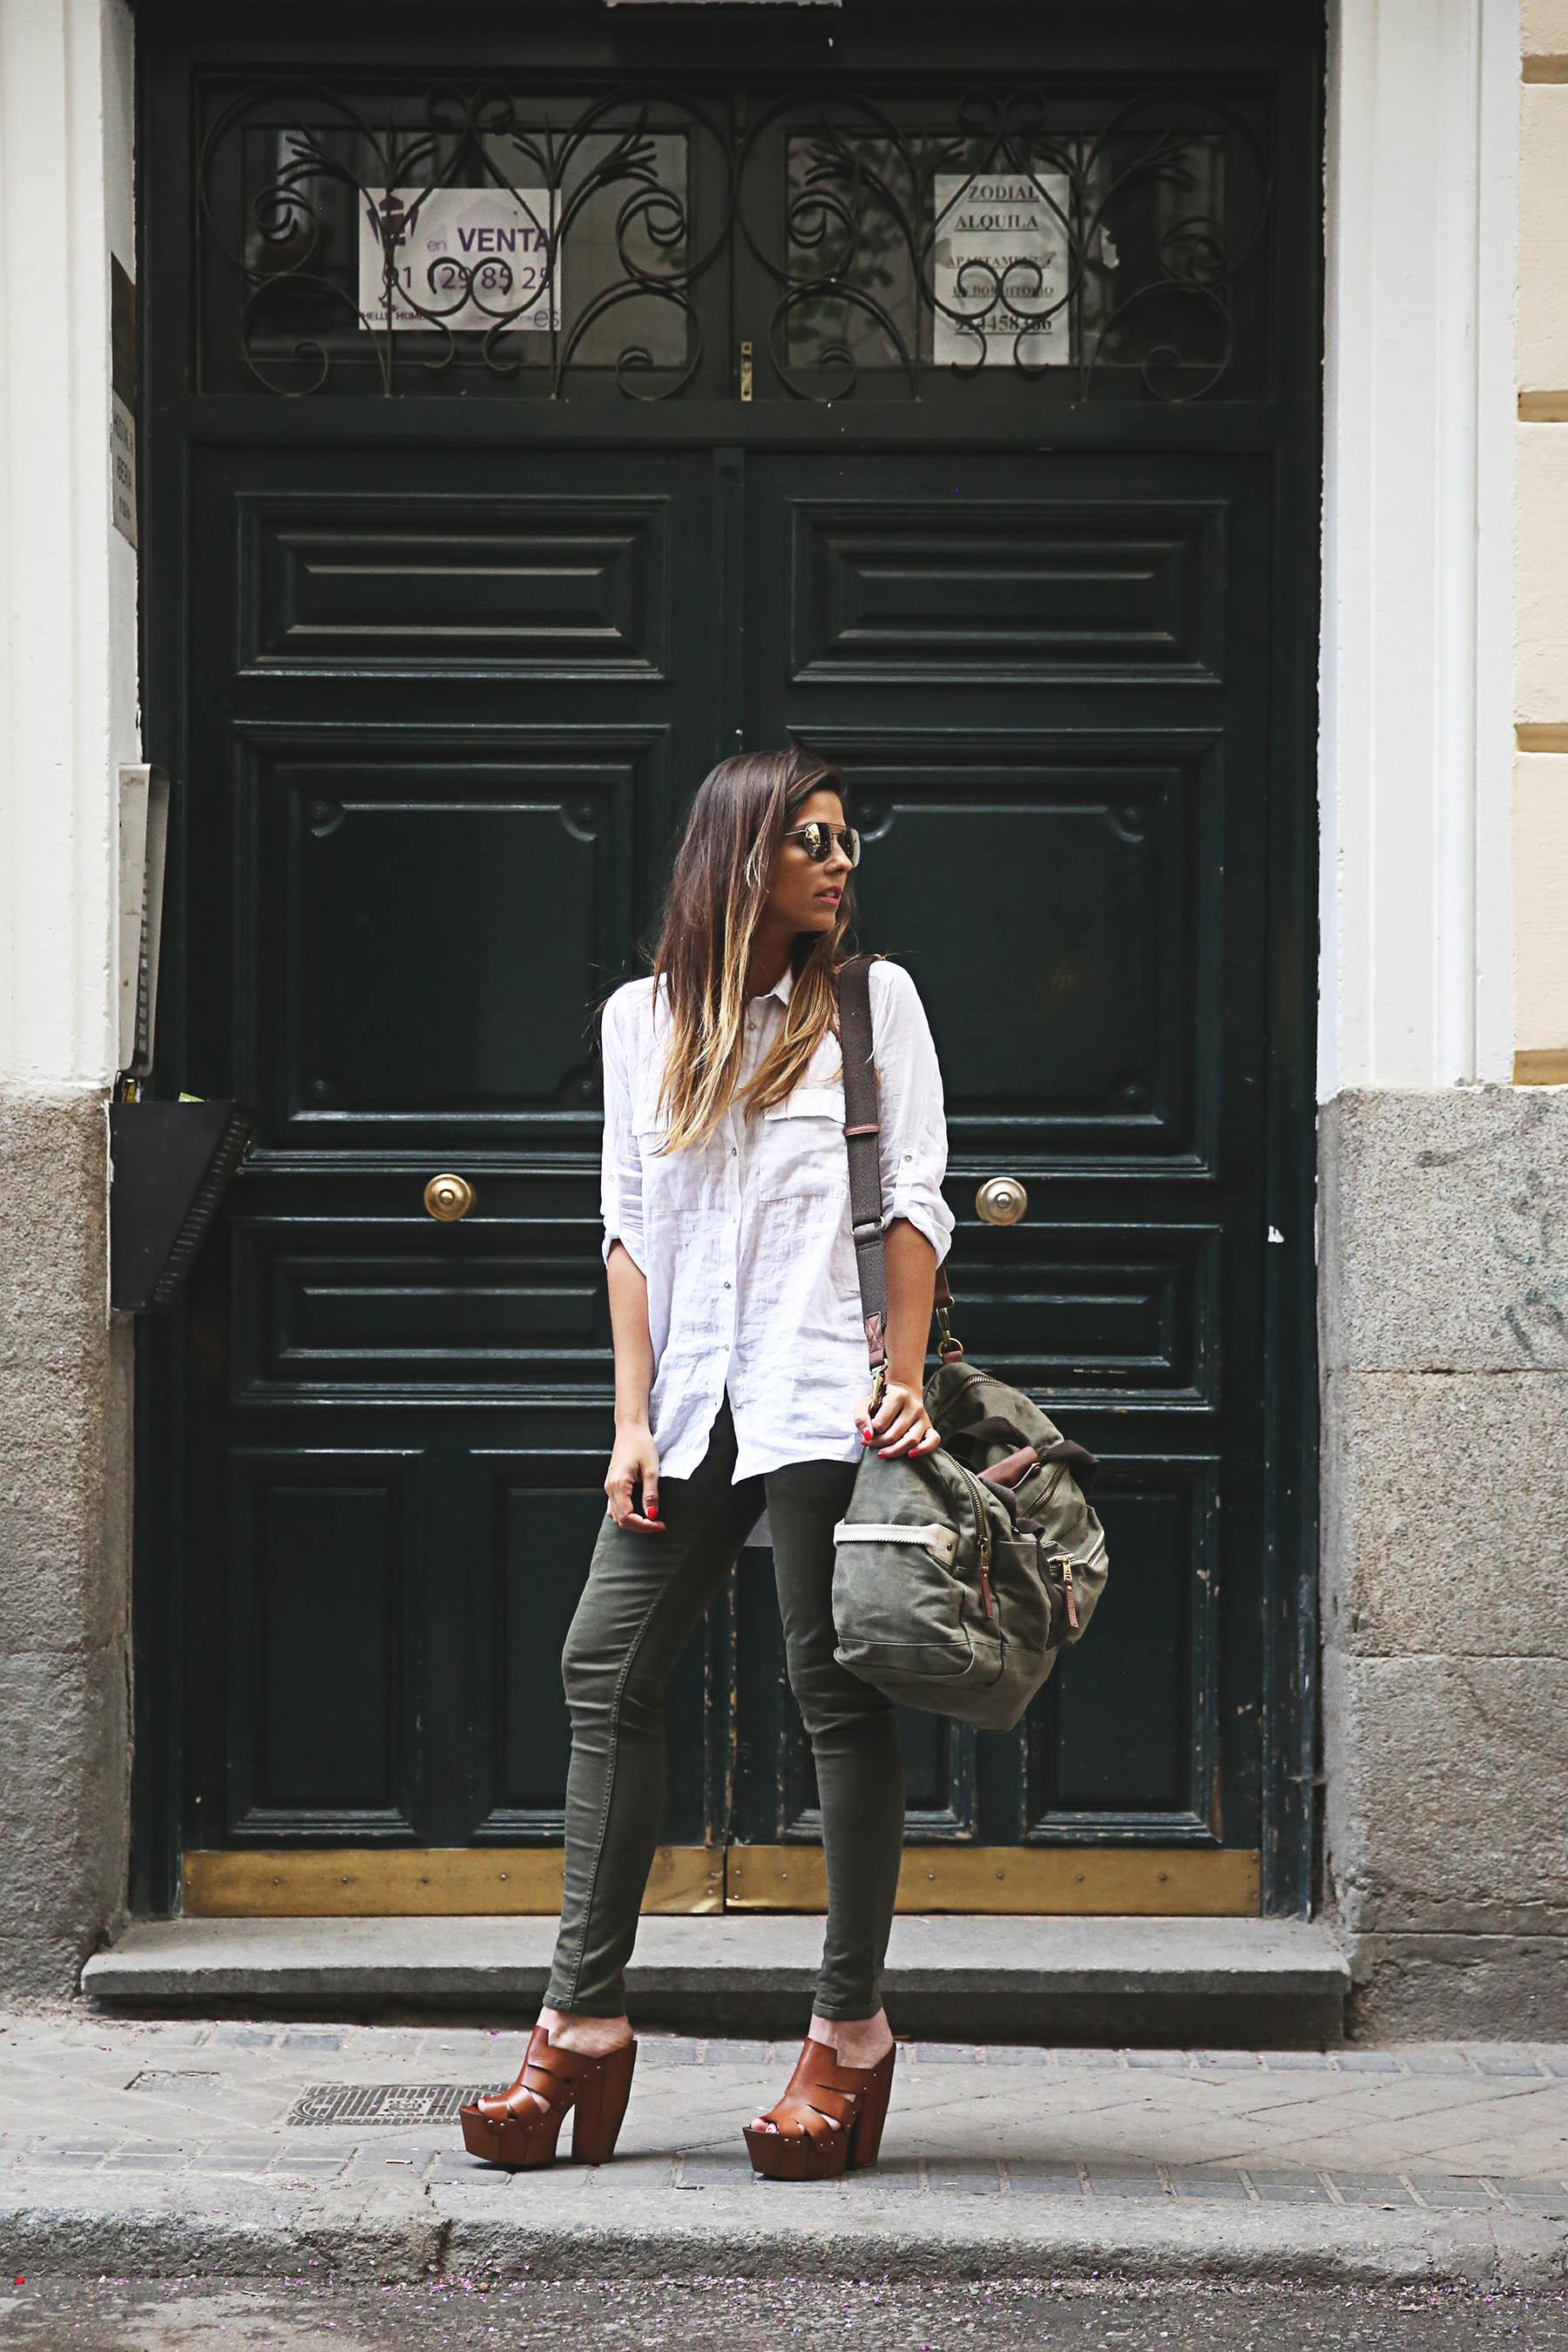 trendy-taste-look-outfit-street-style-steve-madden-ootd-blog-blogger-fashion-spain-moda-españa-safari-traveling-viaje-bolsa-bag-khaki-caqui-pants-sandalias-zuecos-10